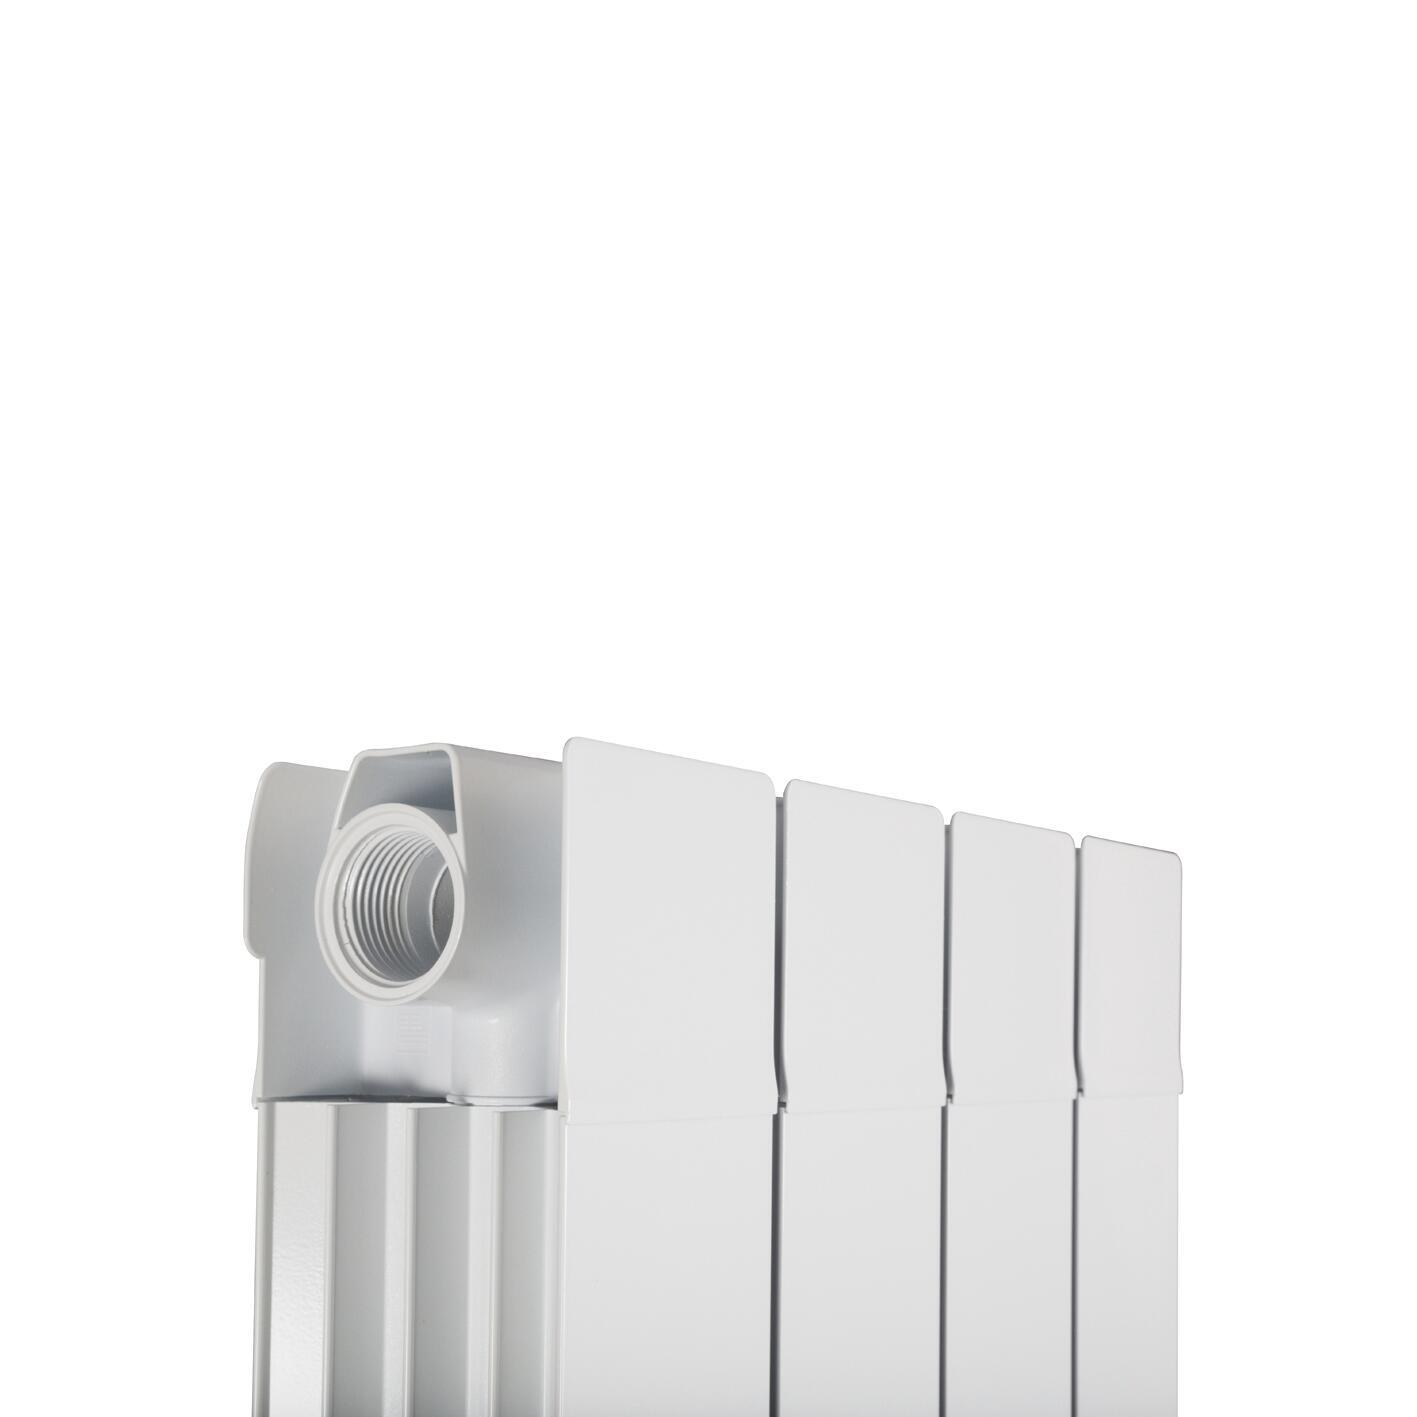 Radiatore acqua calda PRODIGE Superior in alluminio 4 elementi interasse 180 cm - 3